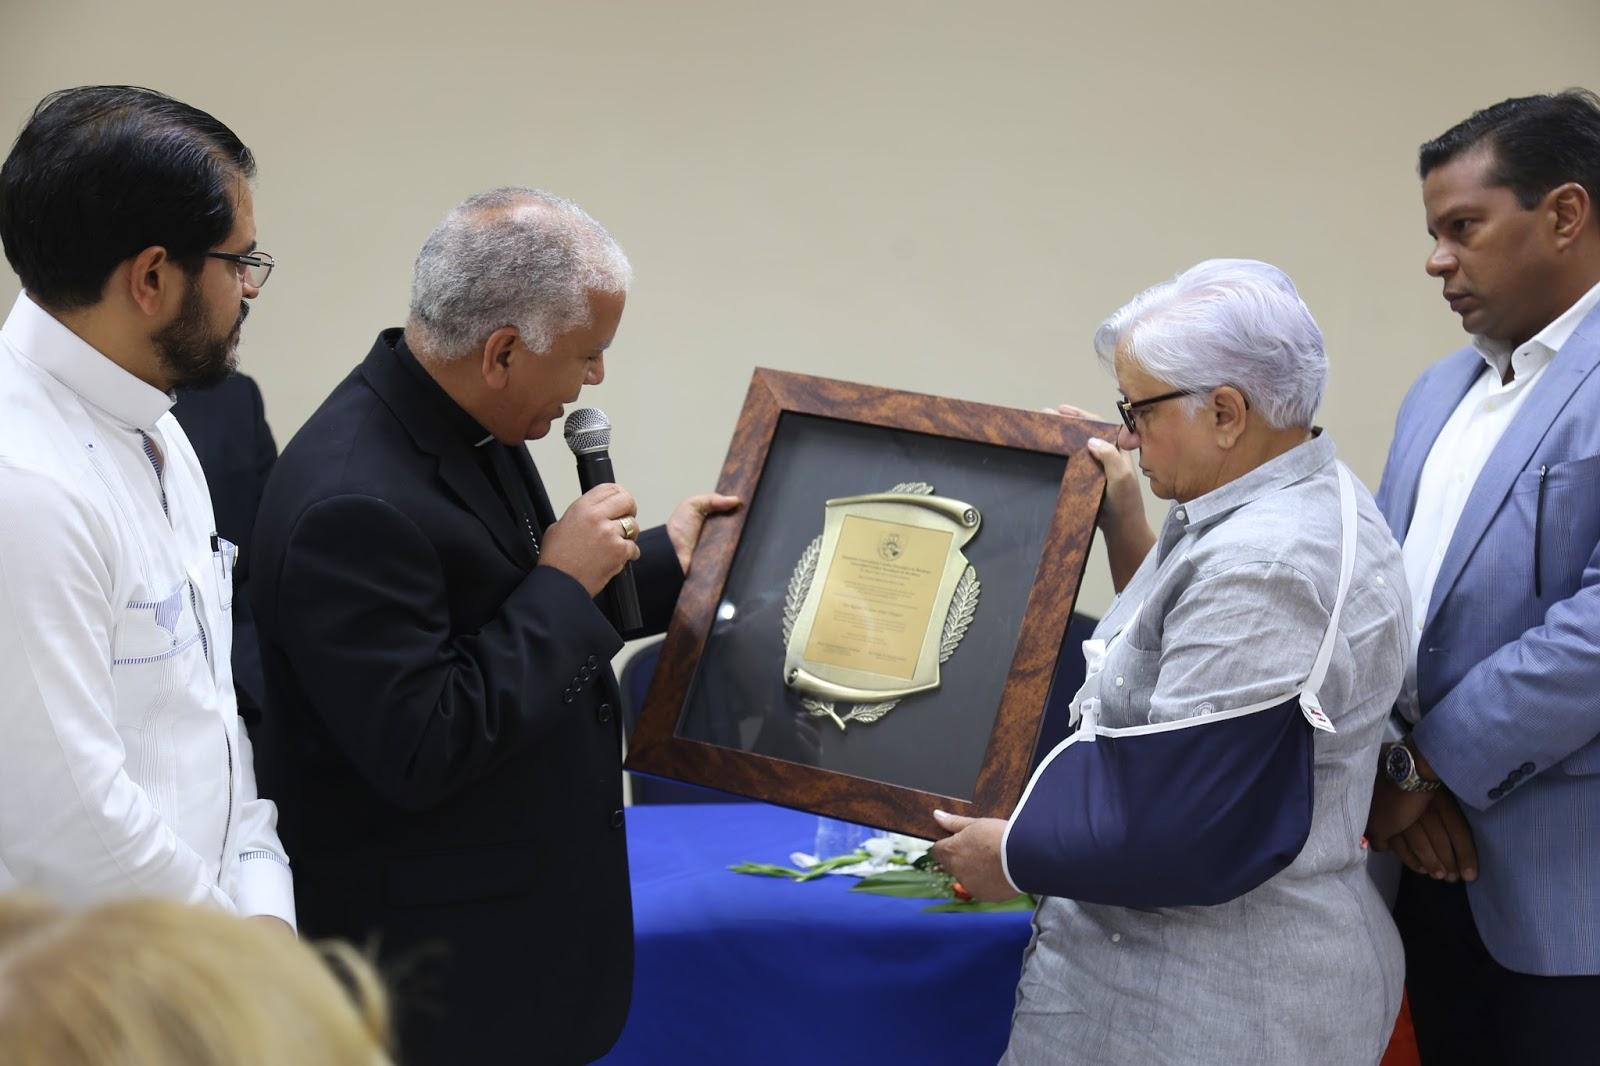 UCATEBA dedica salón al Dr. Rafael Atilano Díaz Vásquez